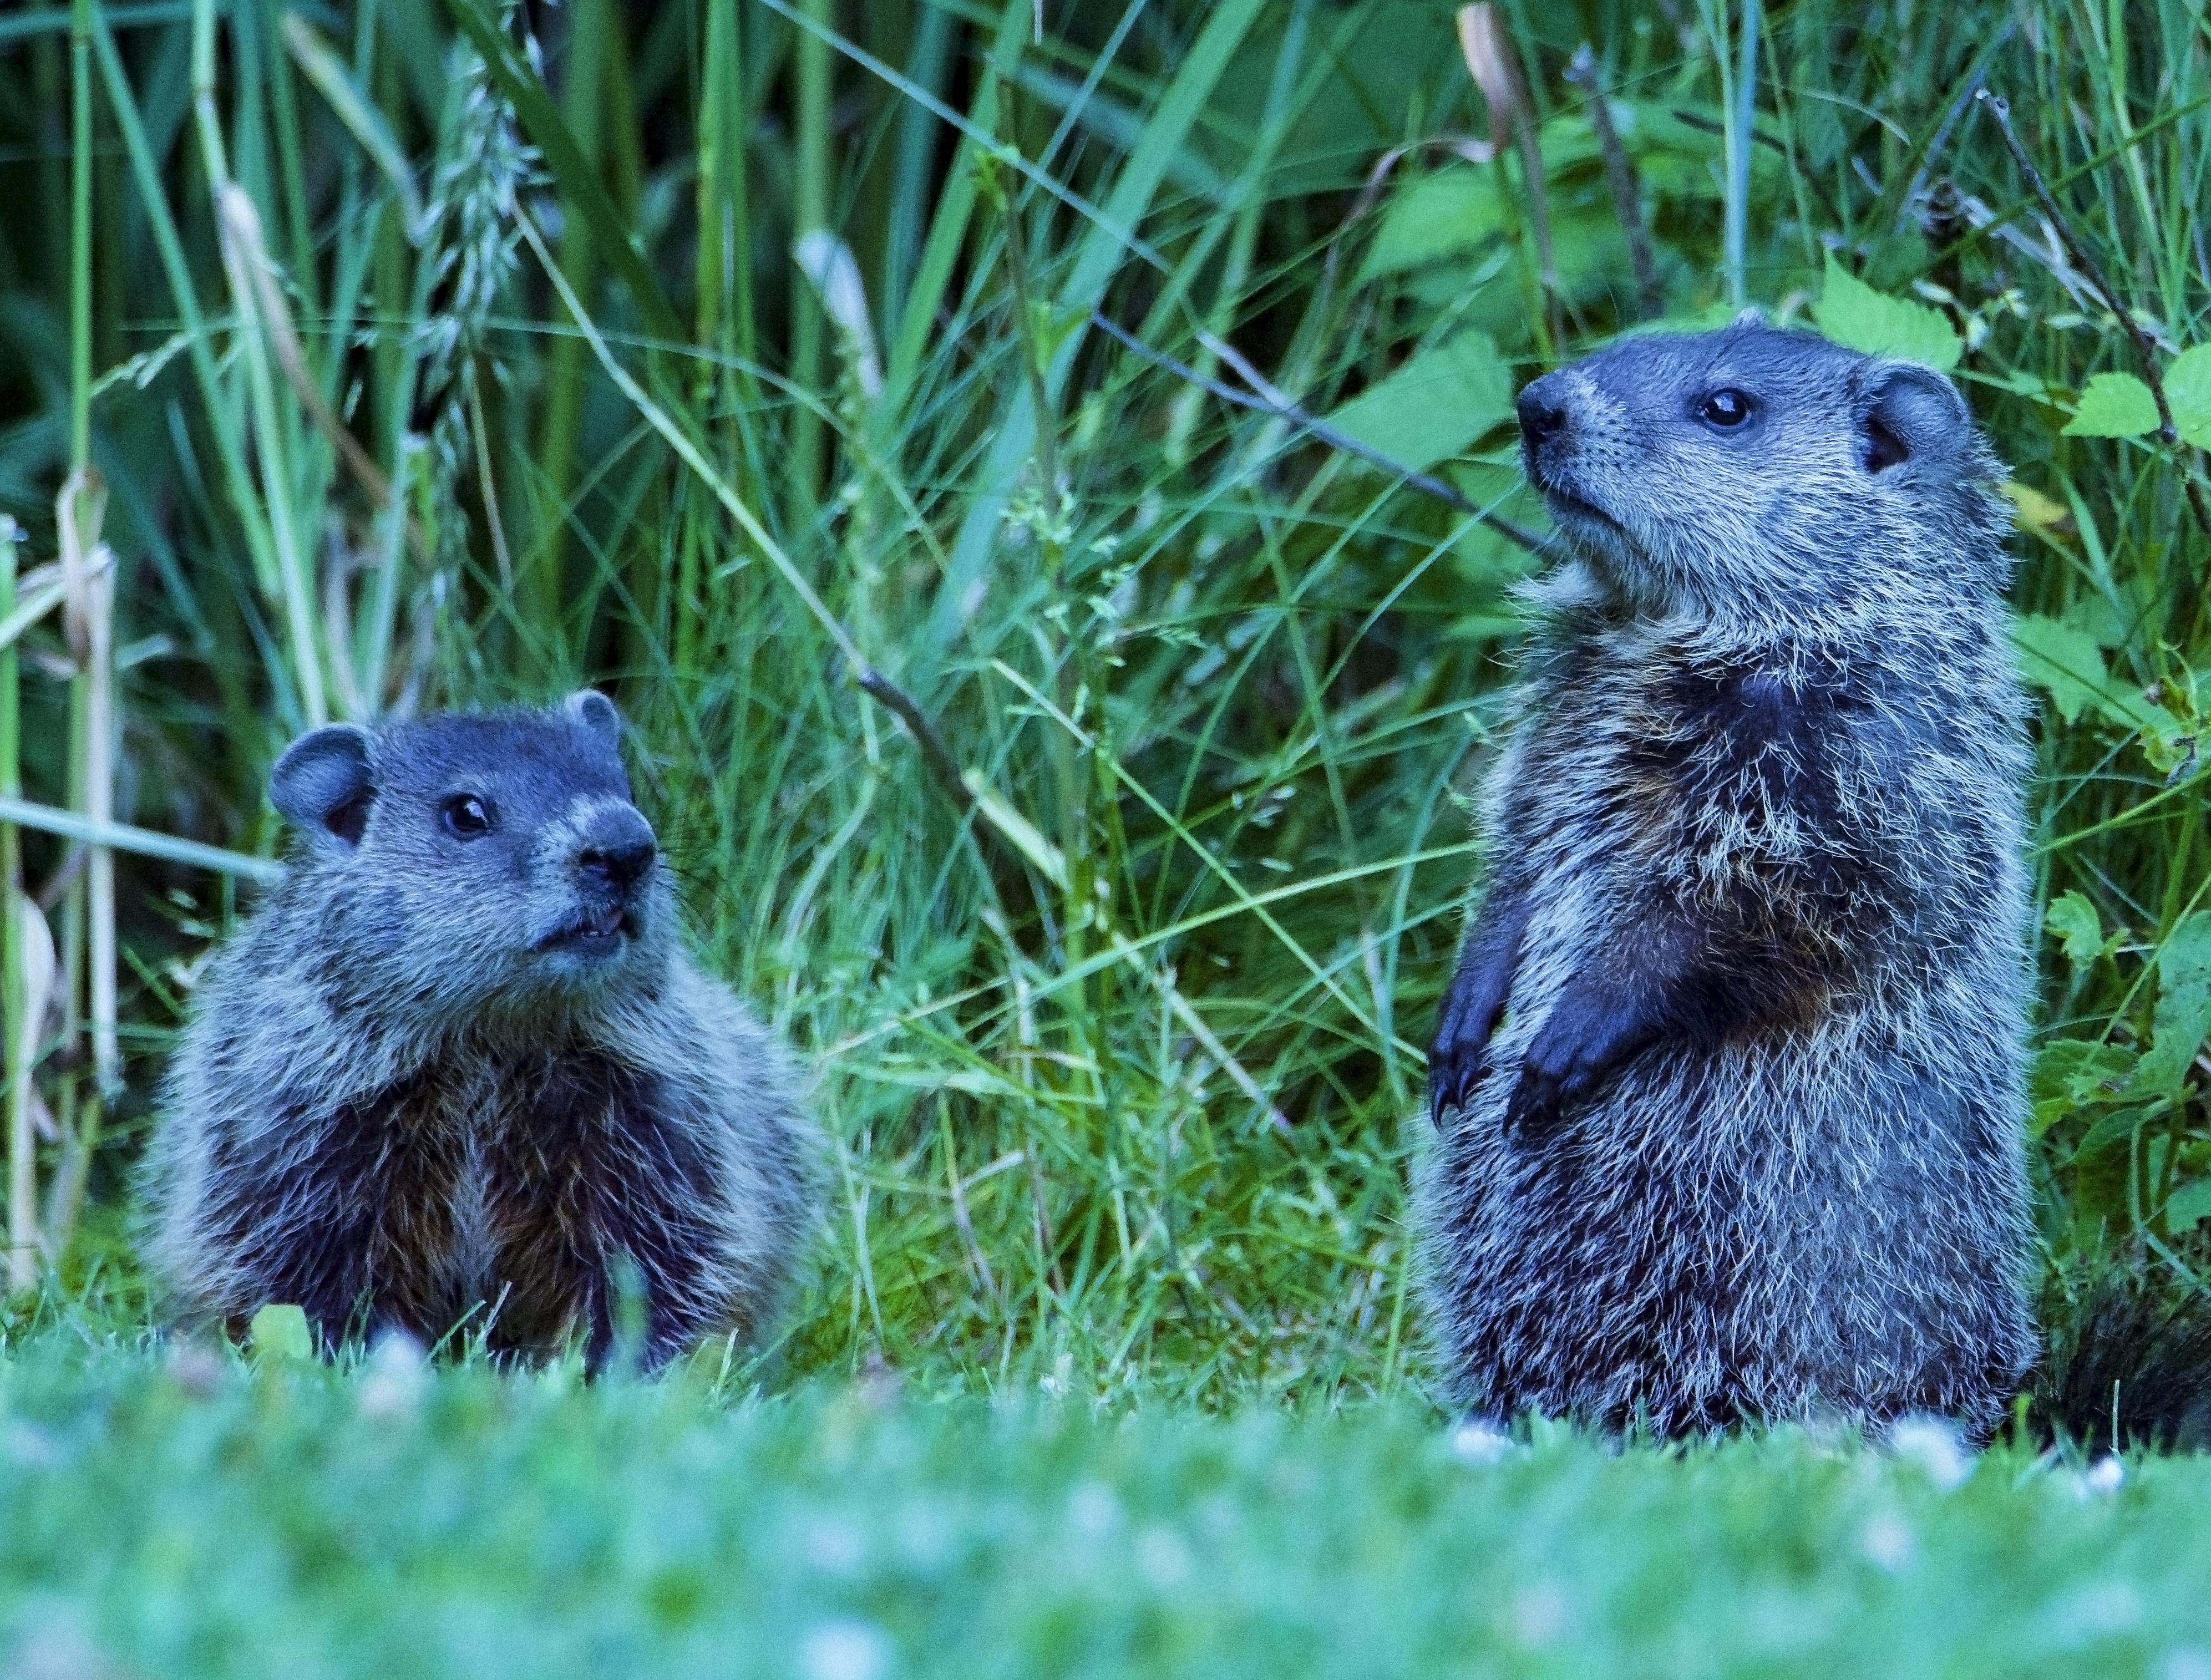 Groundhogs 2020